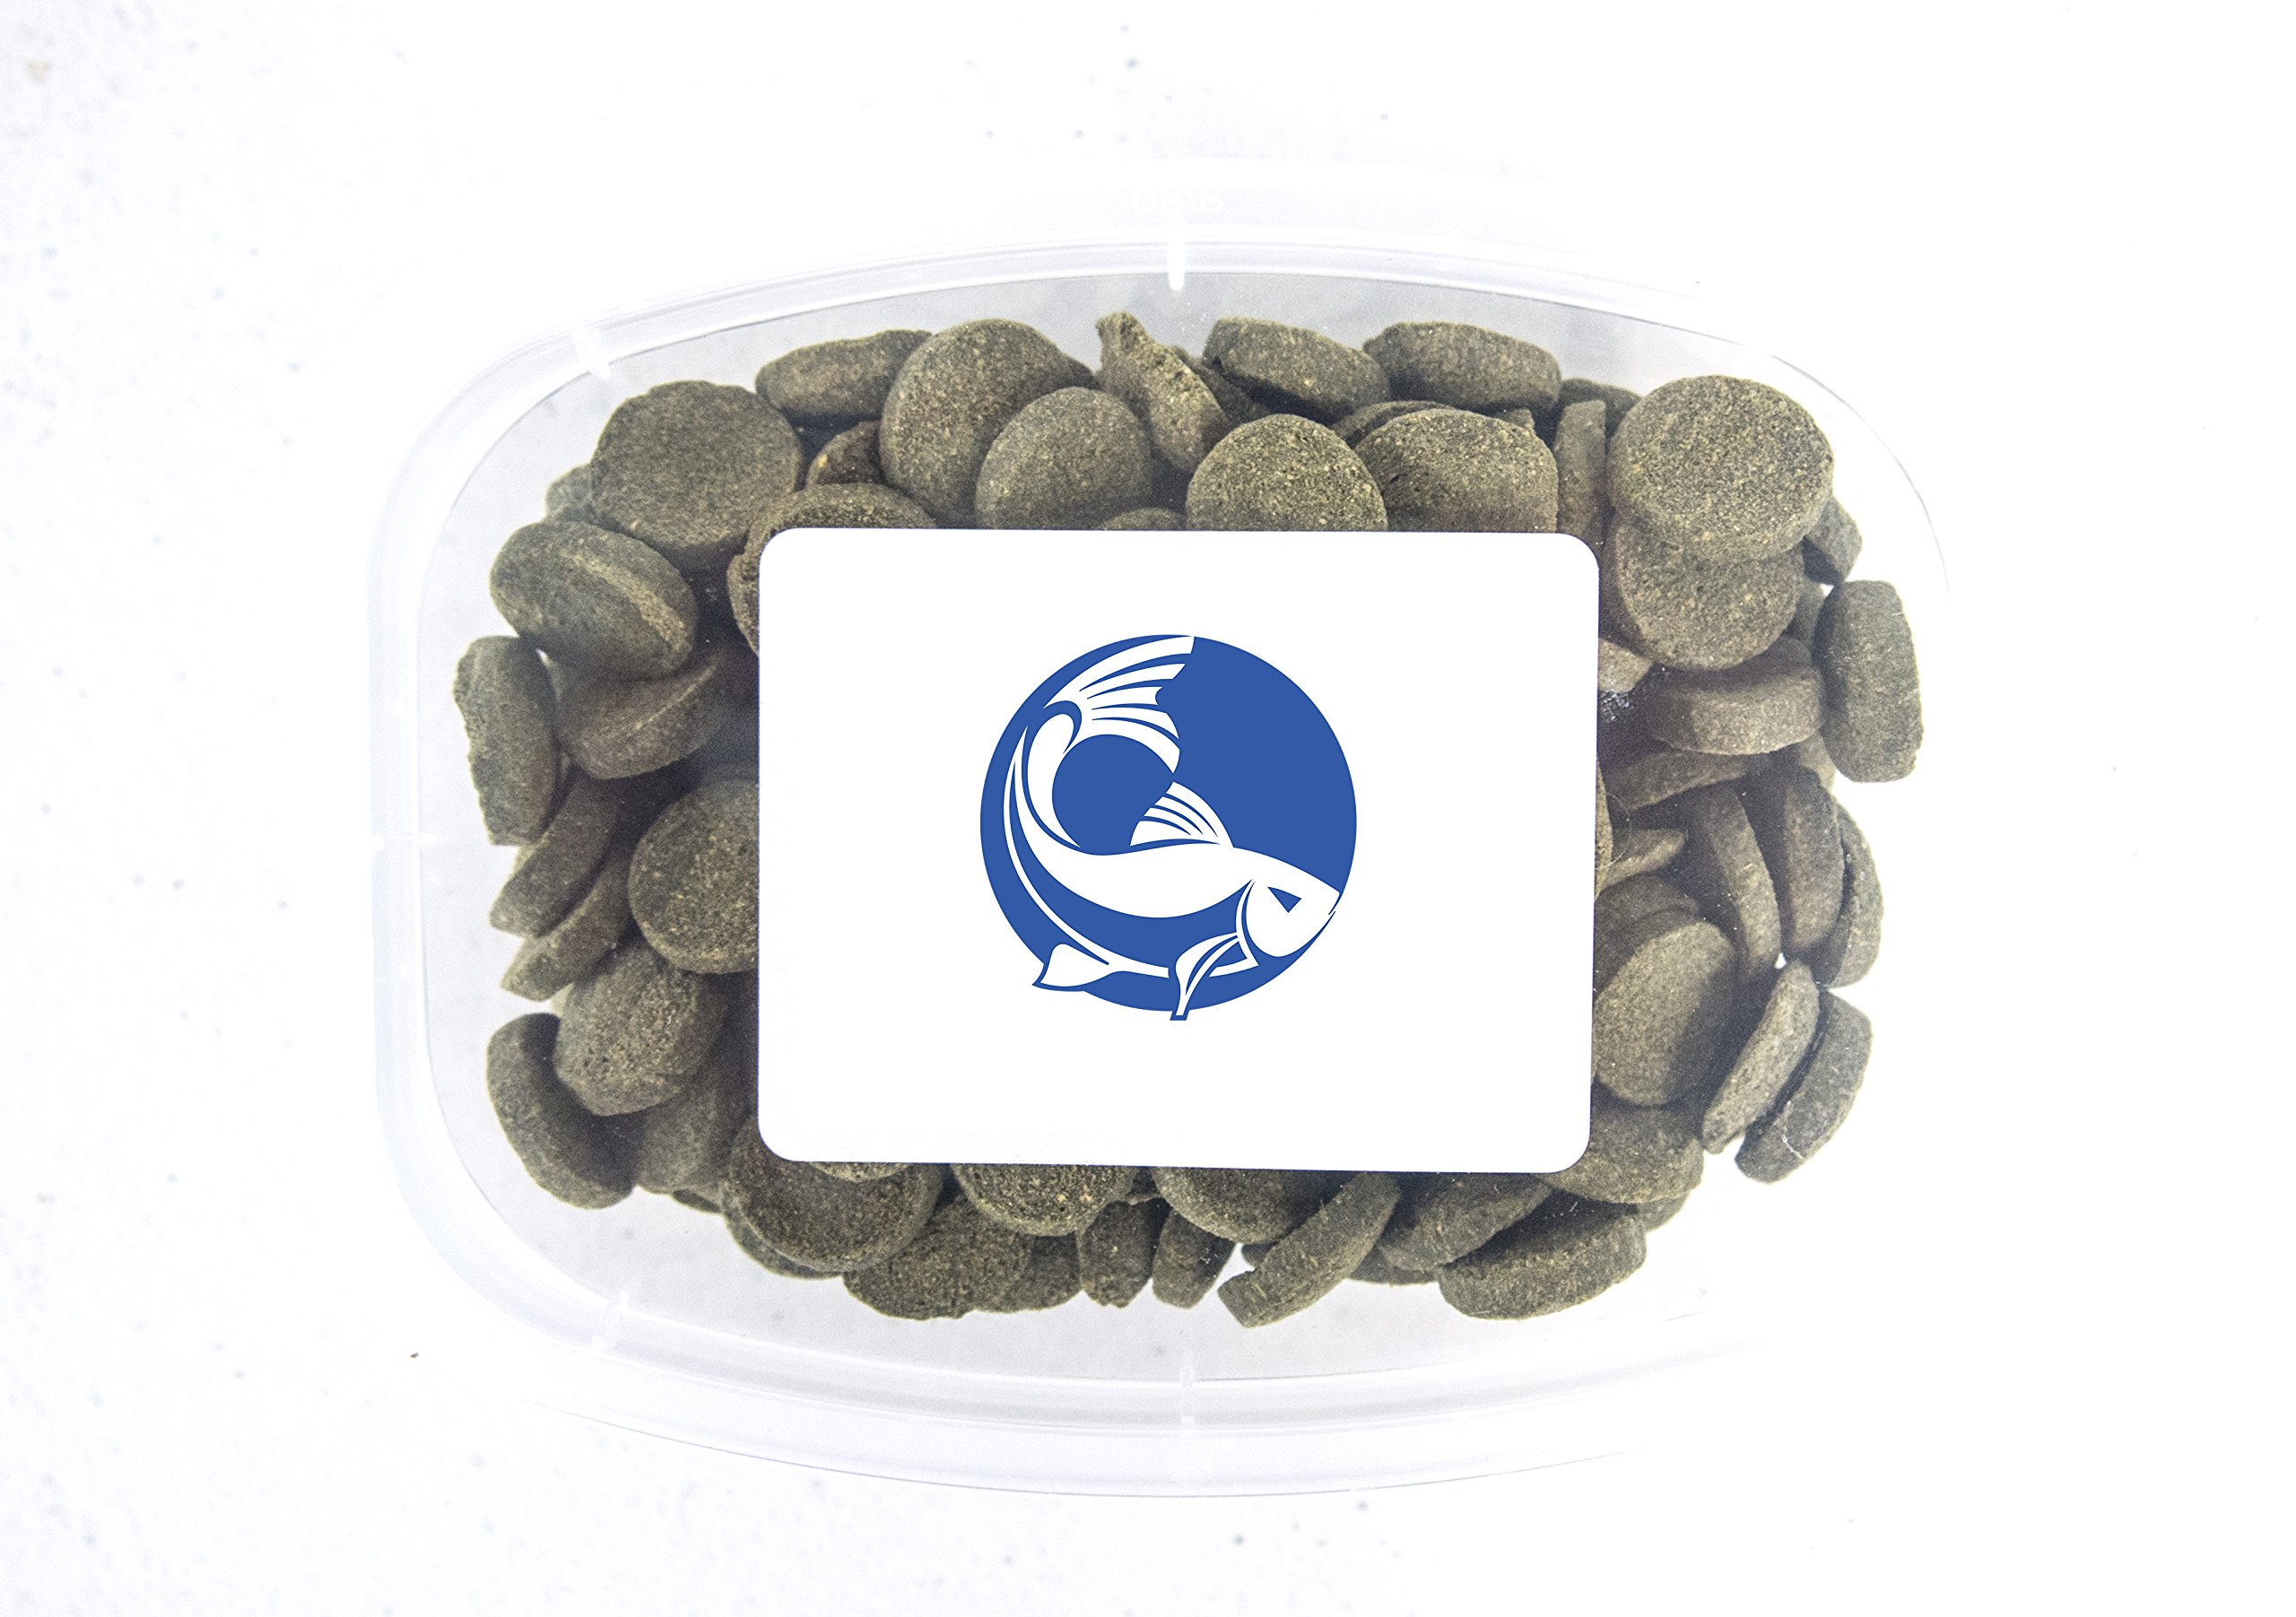 Aquatic Arts Algae Wafers - Sinking Food for Live Aquarium Shrimp, Fish (Pleco / Tetra), Snails, Bottom Feeders - High Protein Spirulina Blend - 6oz